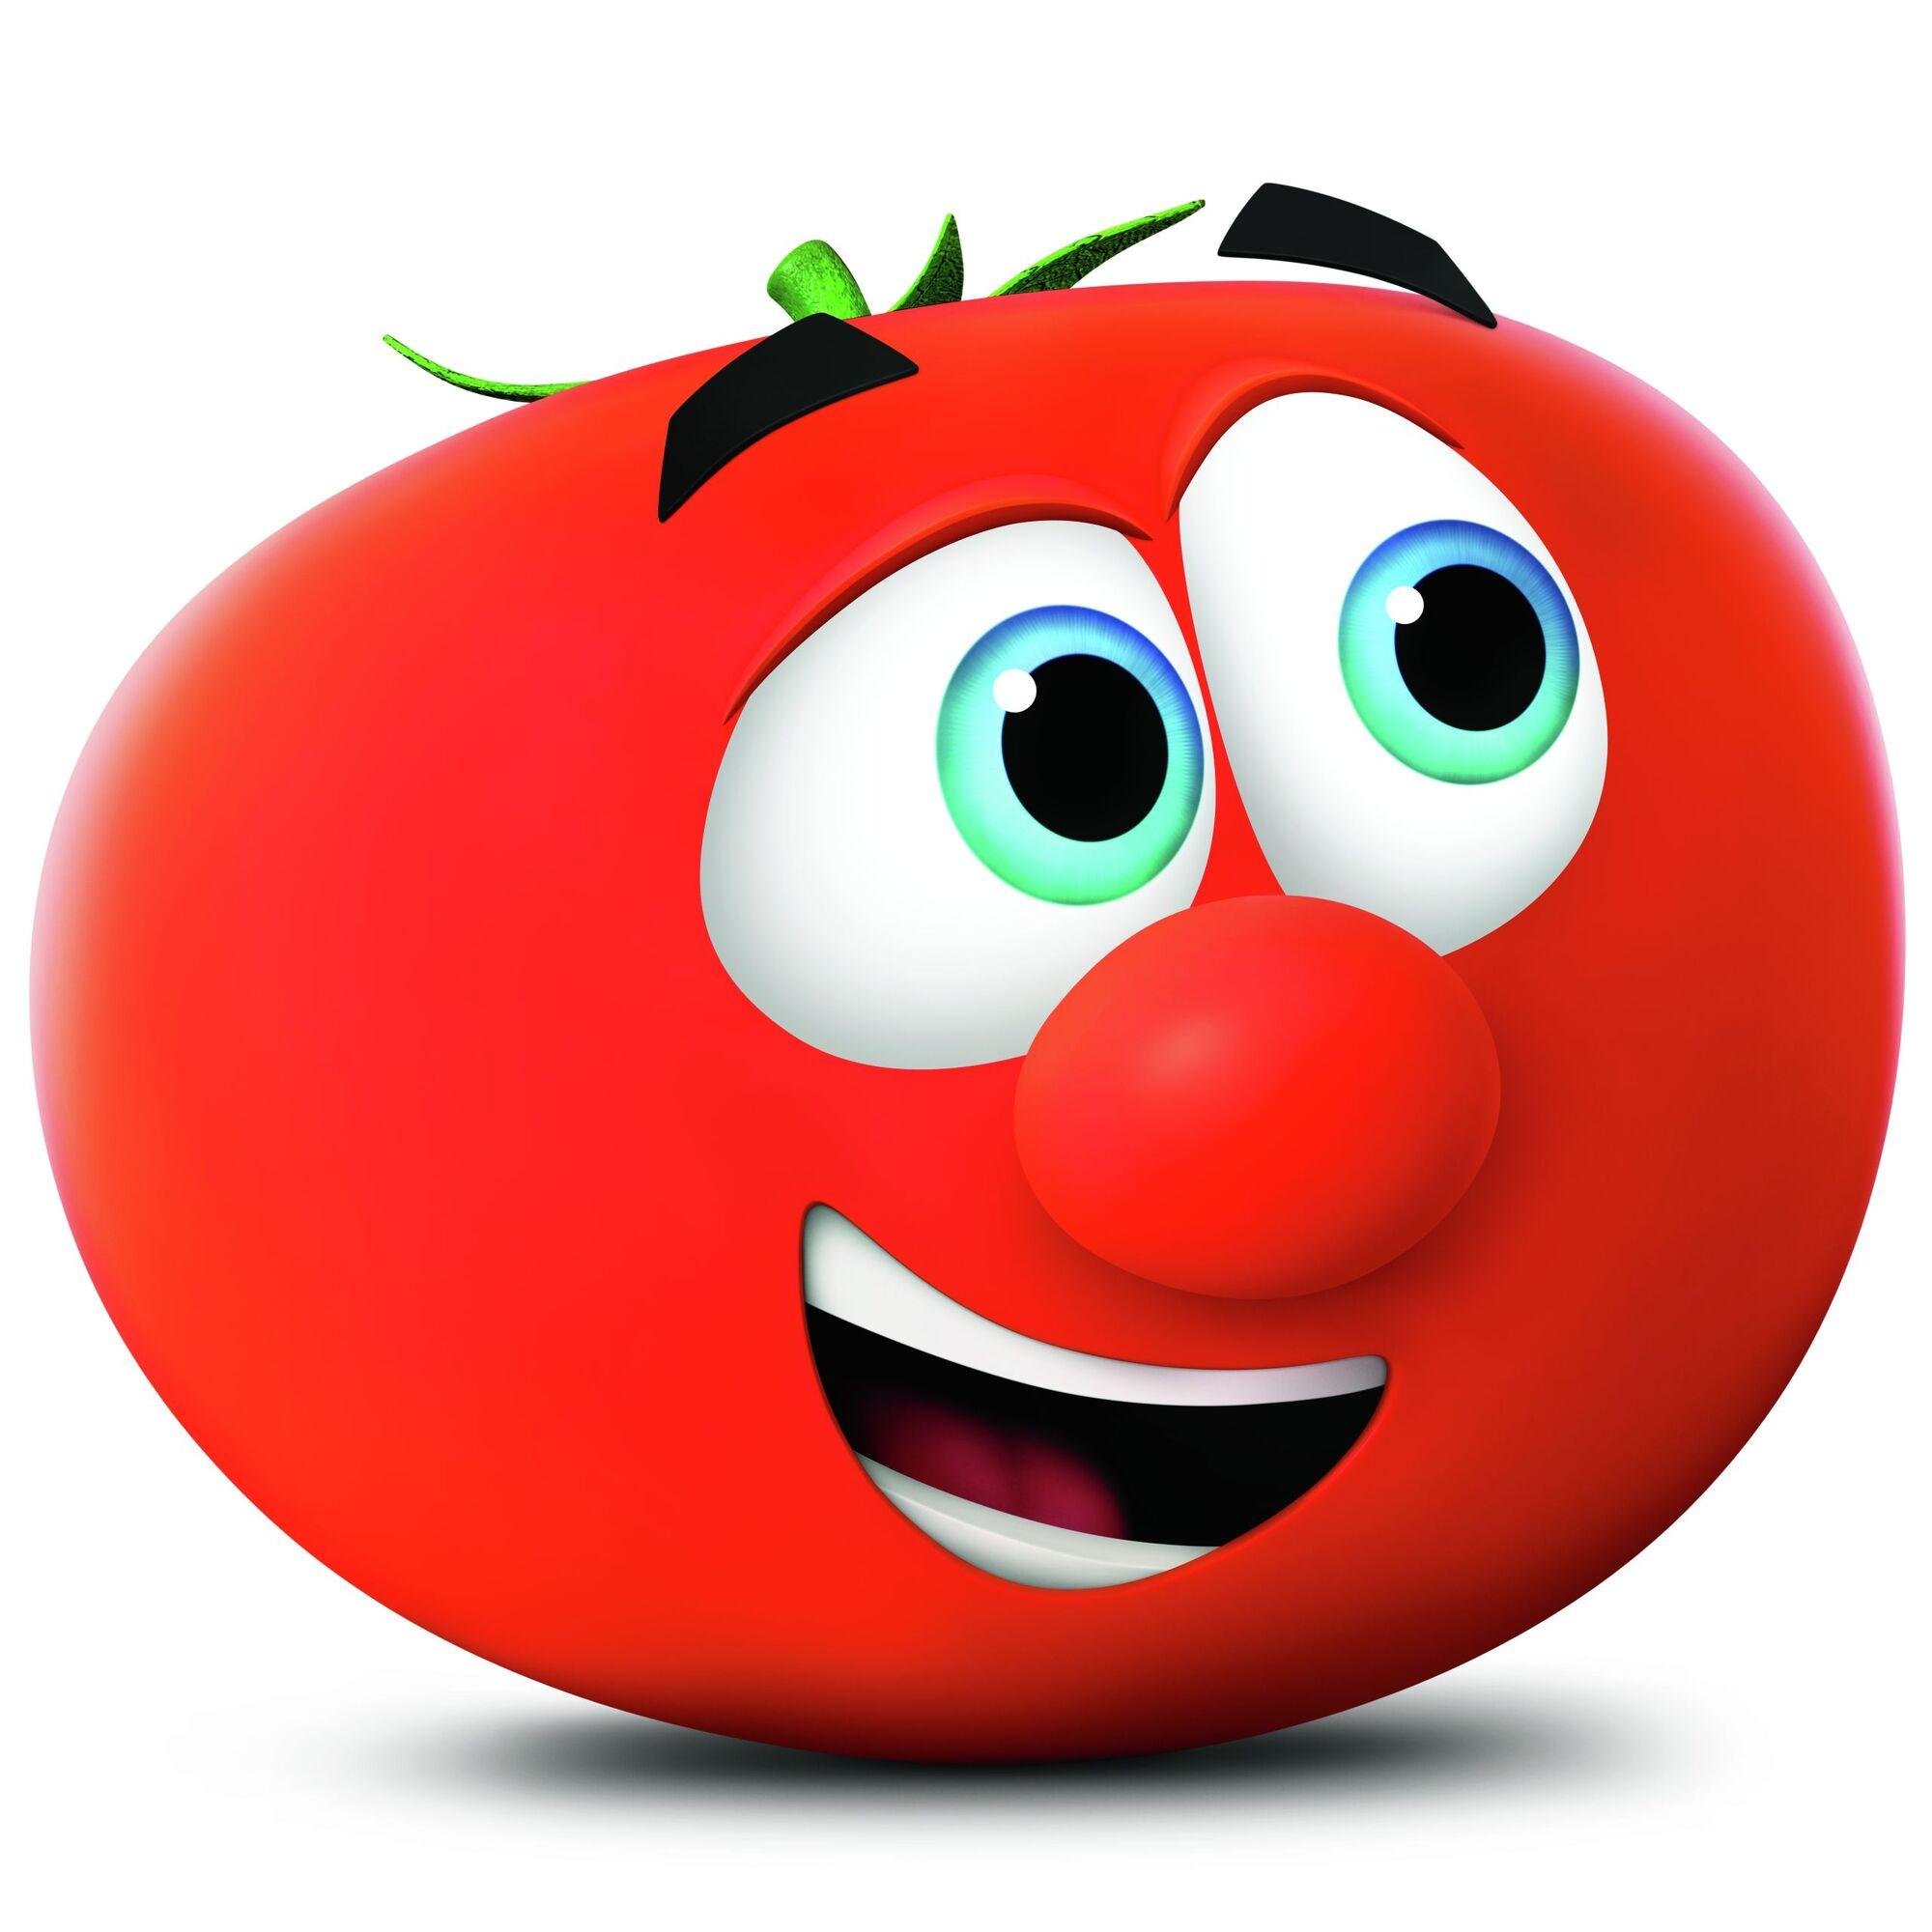 Bob the Tomato | VeggieTales - It's For the Kids! Wiki ... Veggie Tales Larry The Cucumber And Bob The Tomato